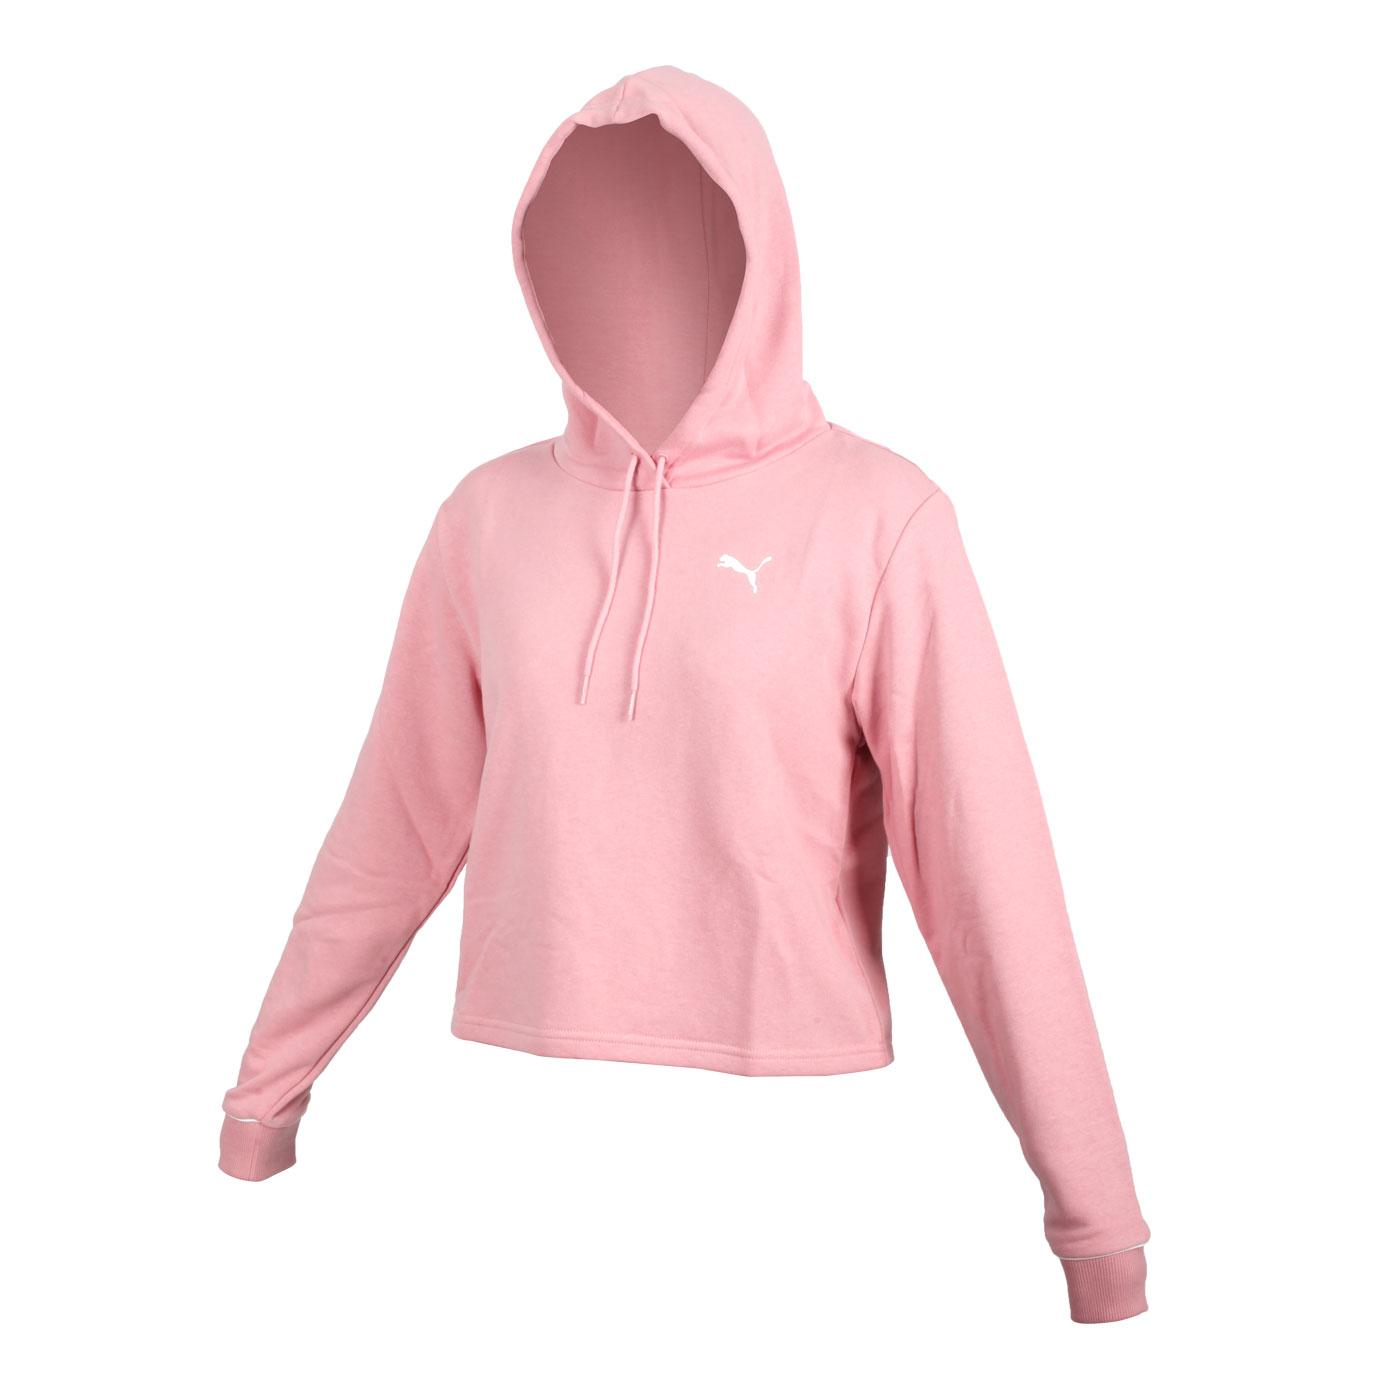 PUMA 女款長厚連帽T恤 58716214 - 粉紅白